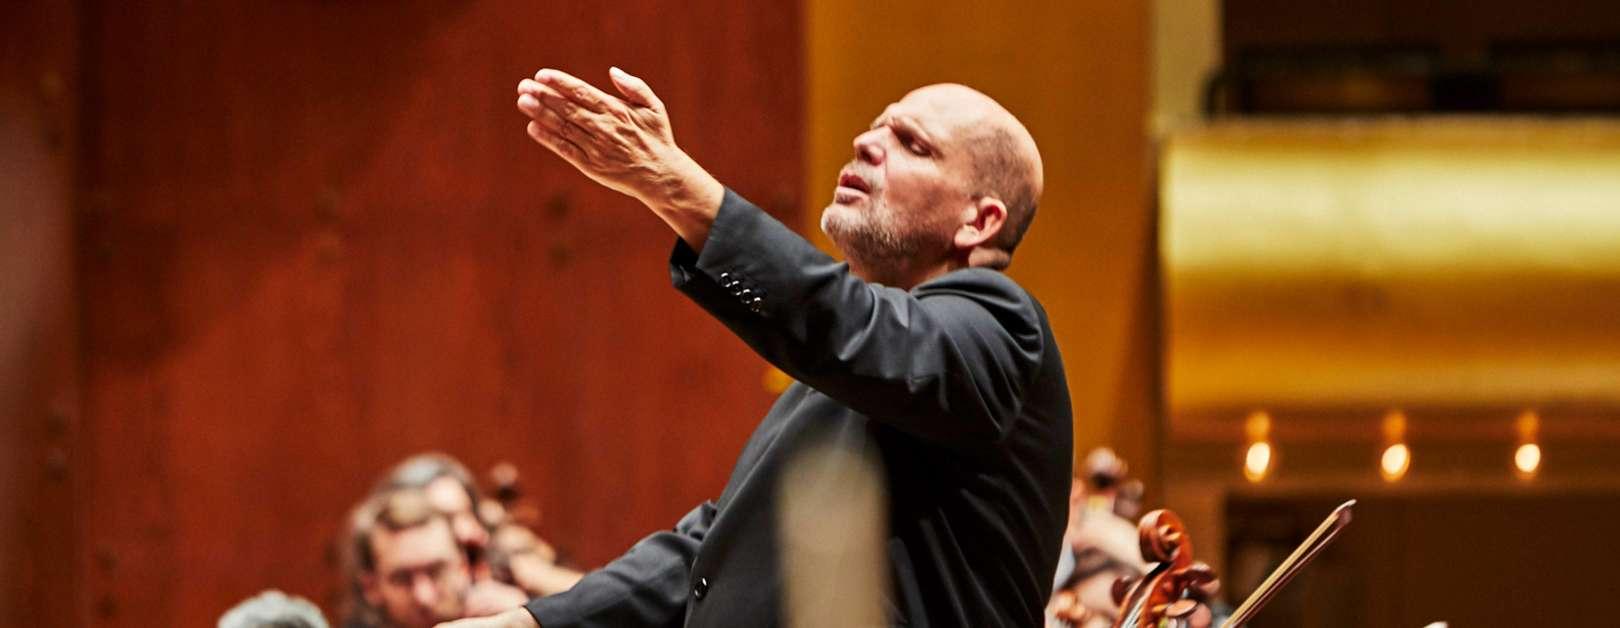 CANCELLED: Jaap van Zweden Conducts Mahler's Resurrection Symphony